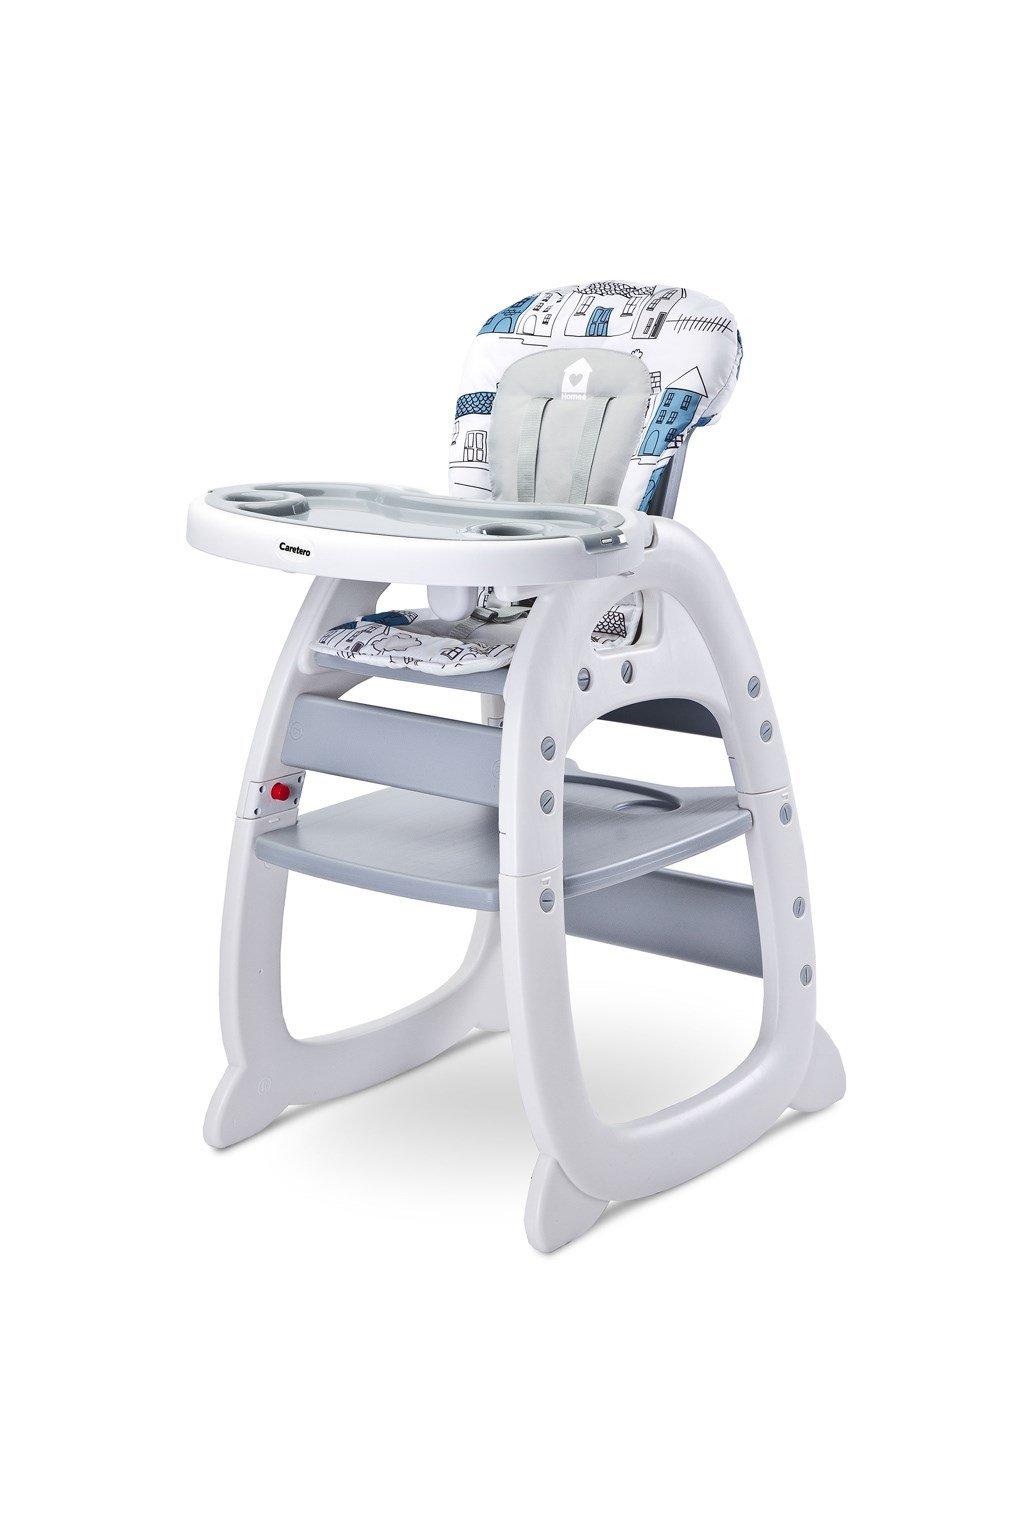 Jedálenská stolička CARETERO HOMEE grey